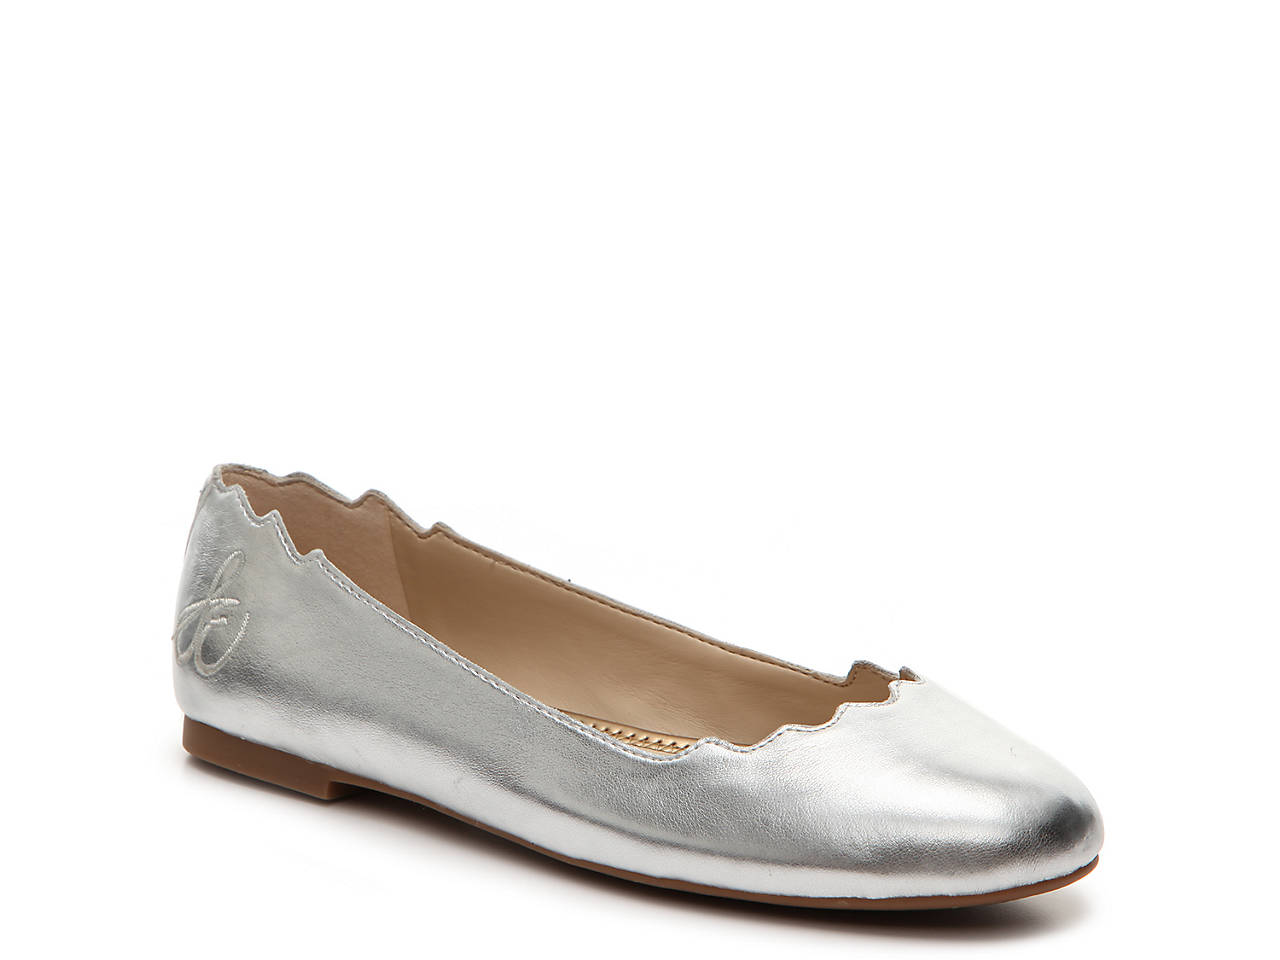 1c3ca88e9aa07 Sam Edelman Finnegan Ballet Flat Women s Shoes